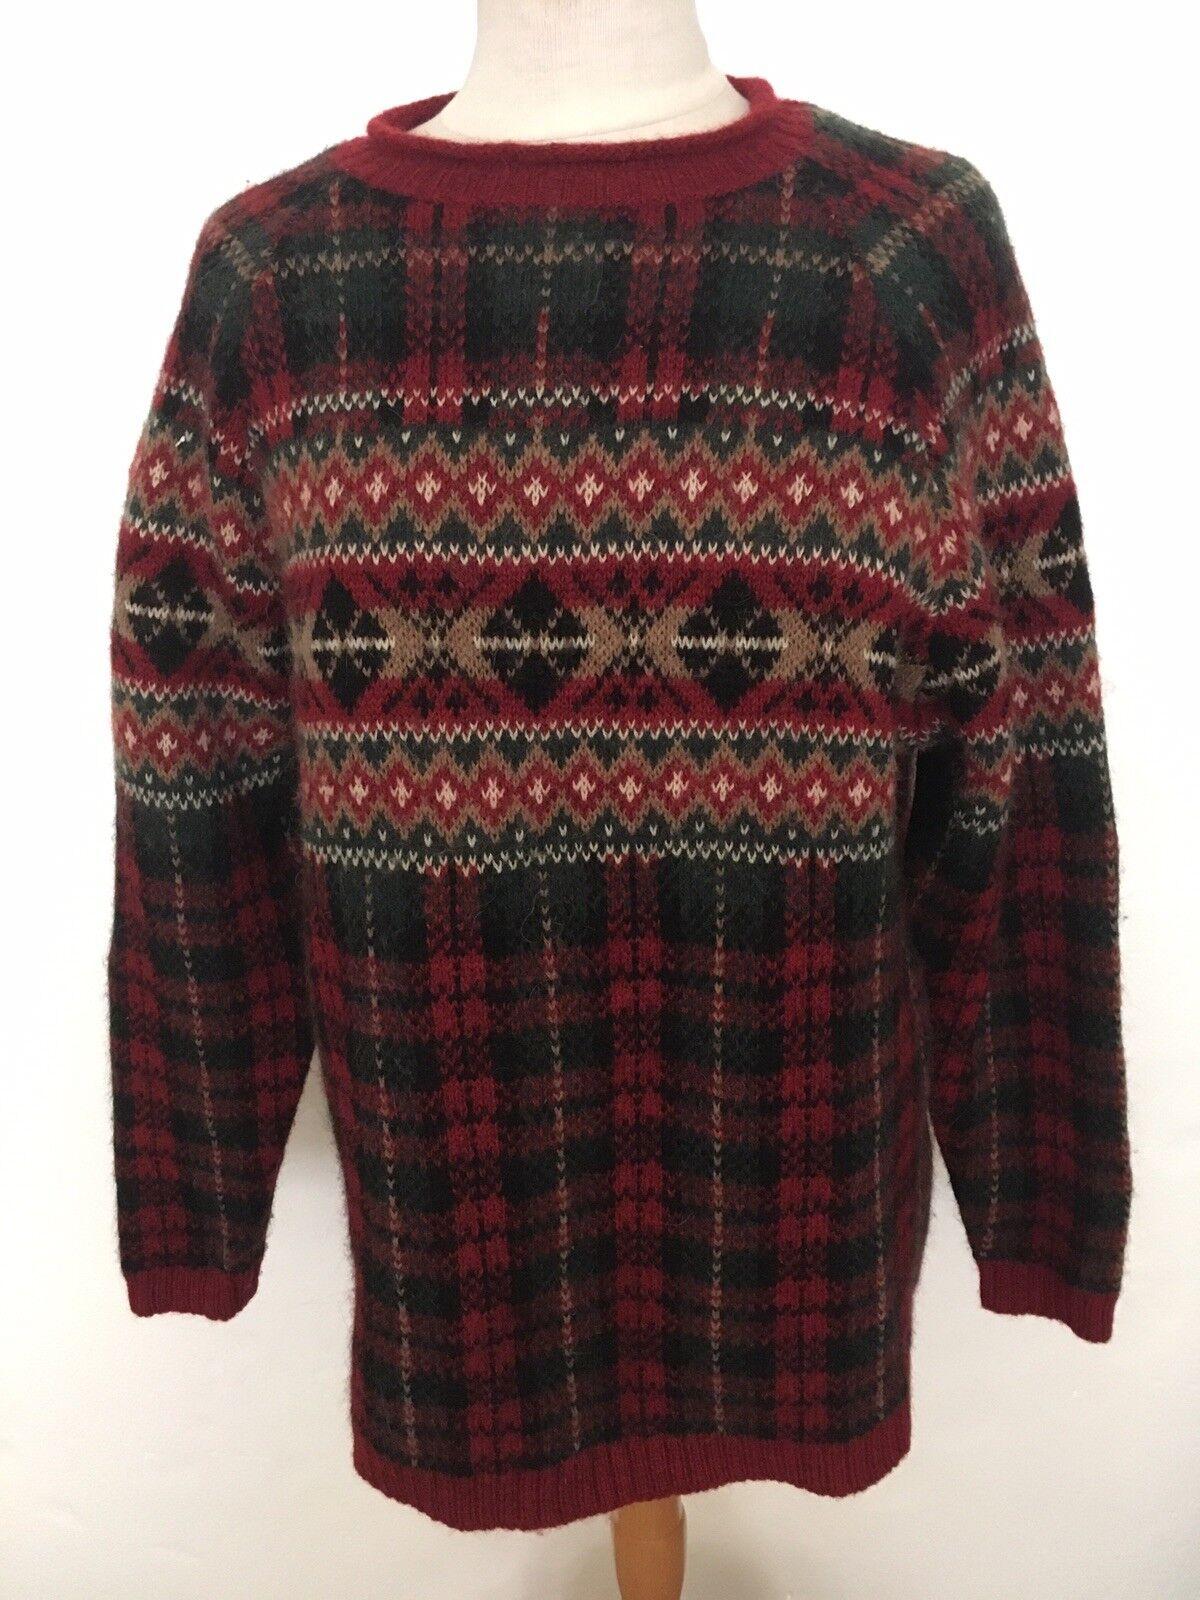 Jones New York Red Green Wool Alpaca Nordic Sweater Sz M